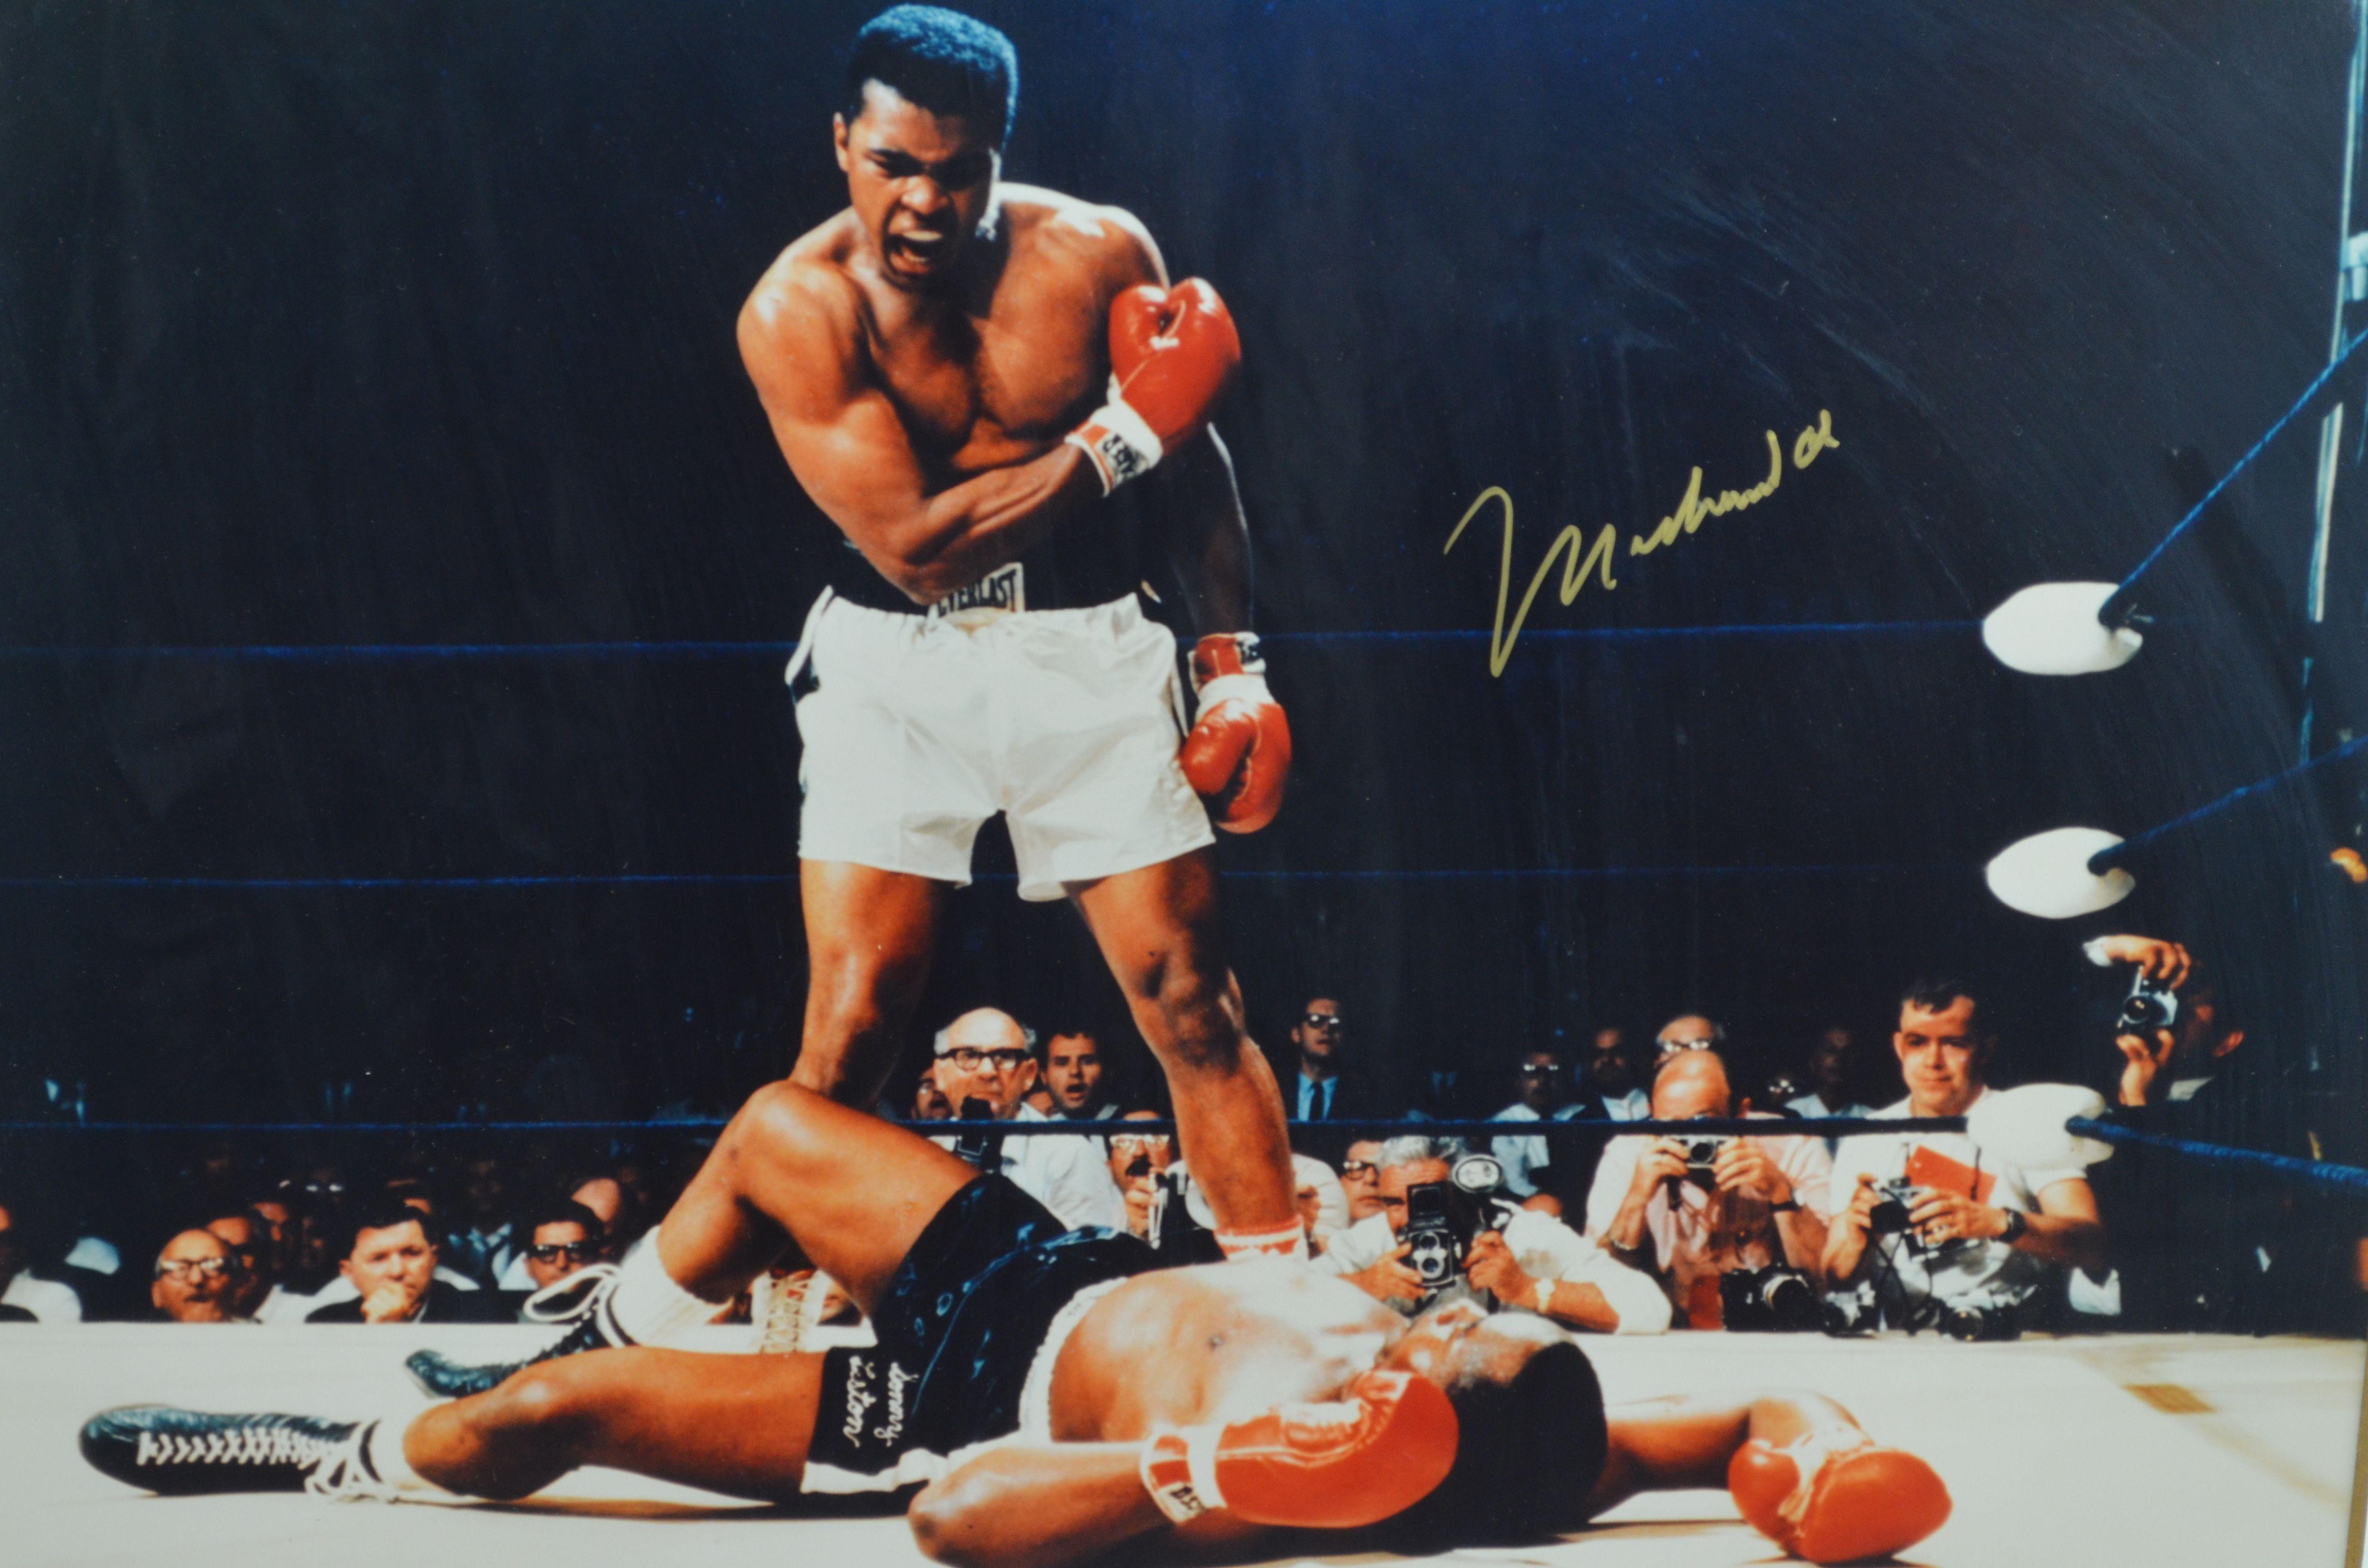 muhammad ali sonny liston autographed 16x20 framed photo - Muhammad Ali Framed Pictures